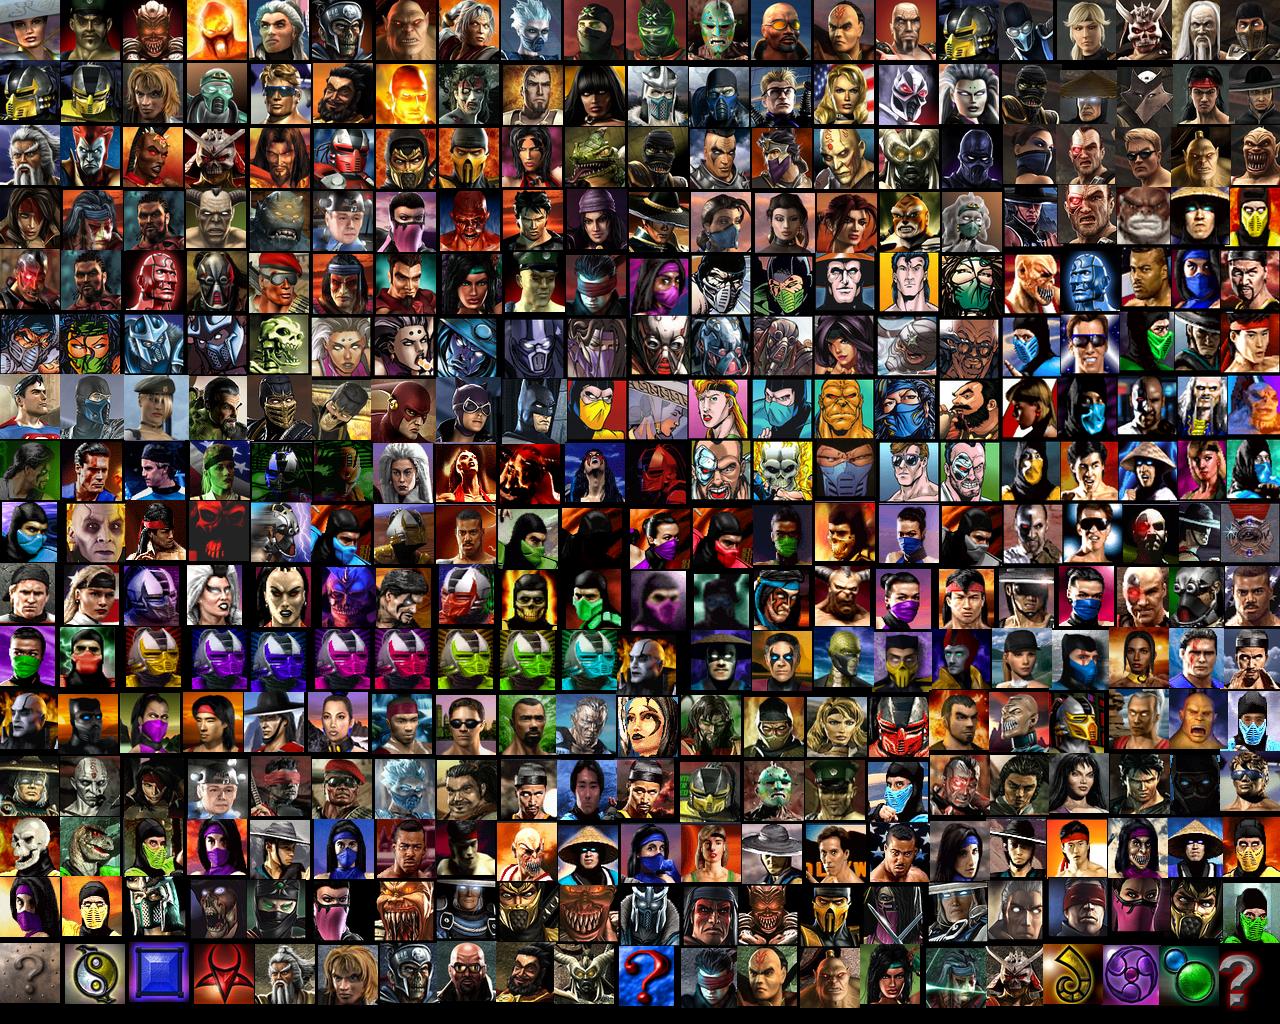 Free Download Mortal Kombat Armageddon Characters 1280x1024 For